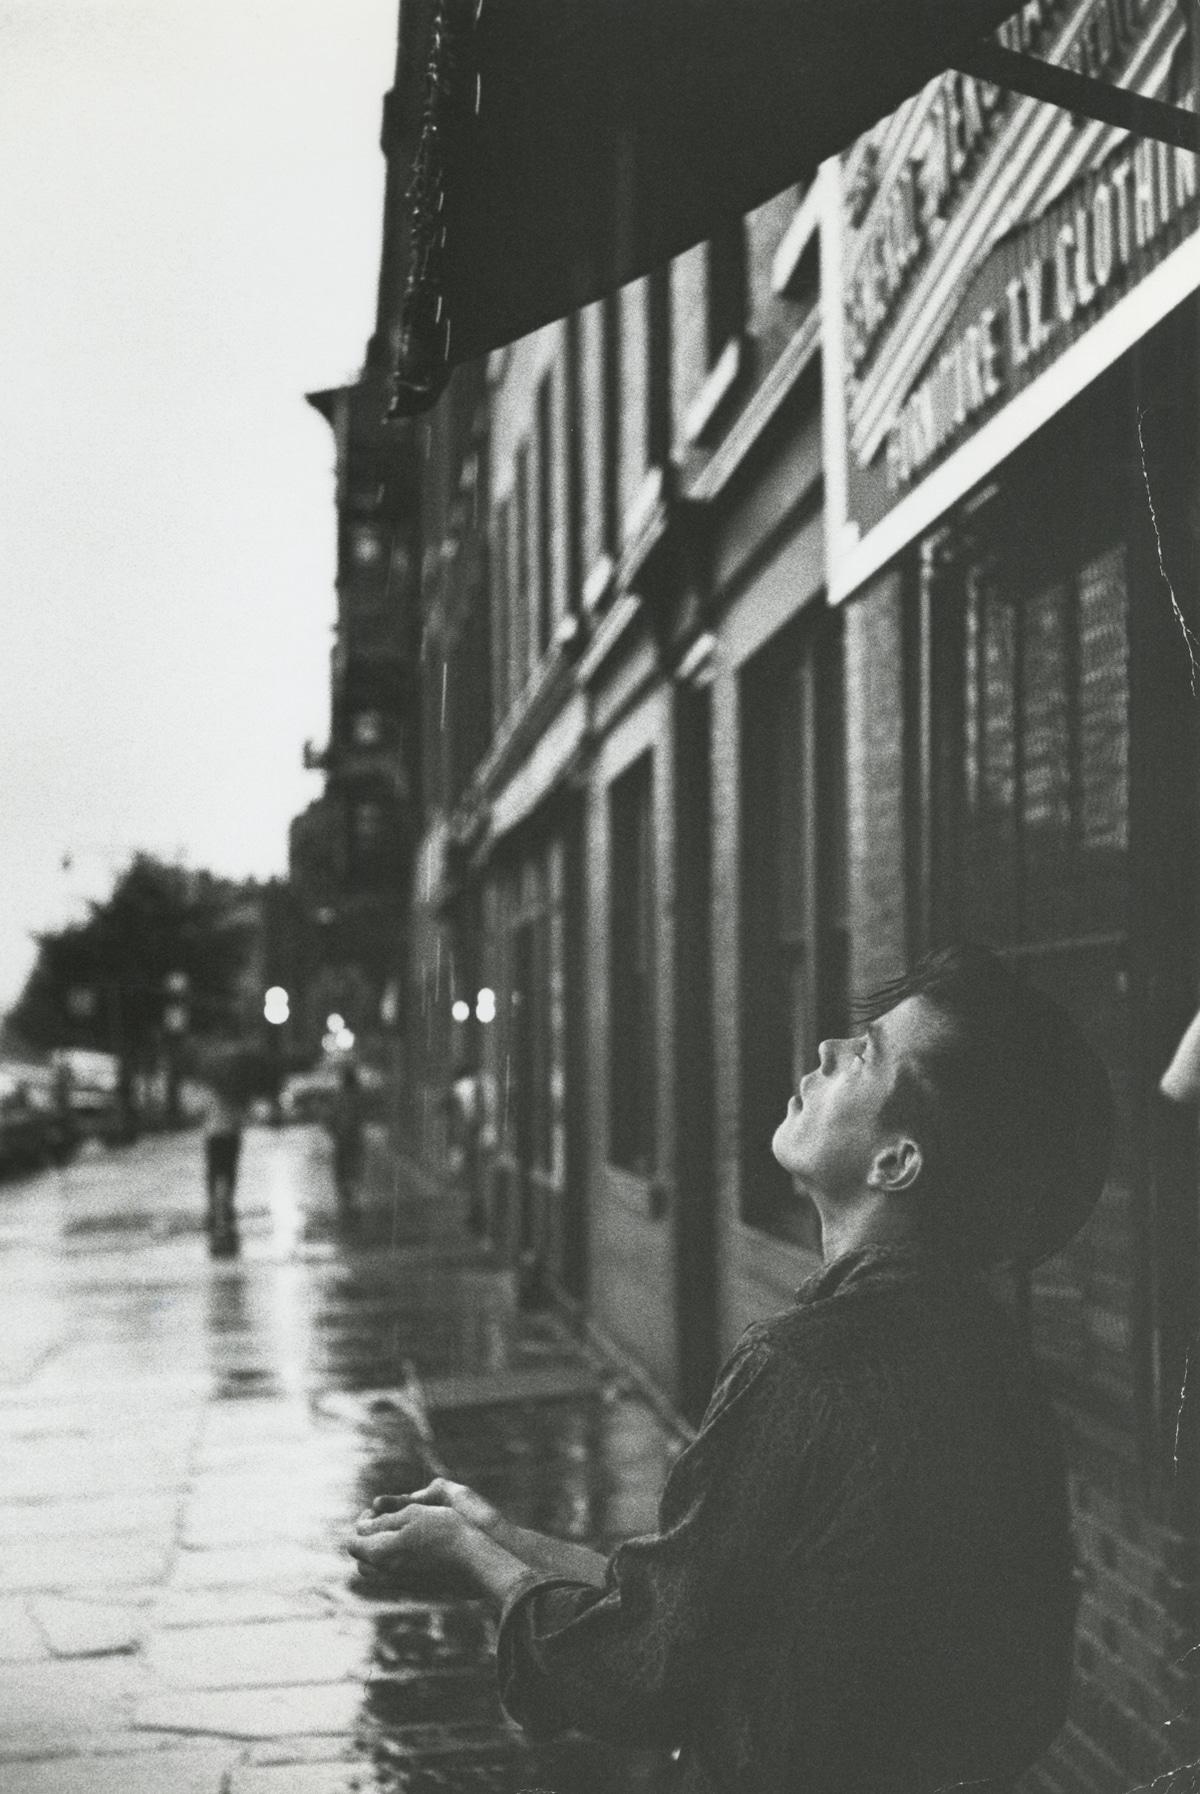 Photographer Bruce Davidson